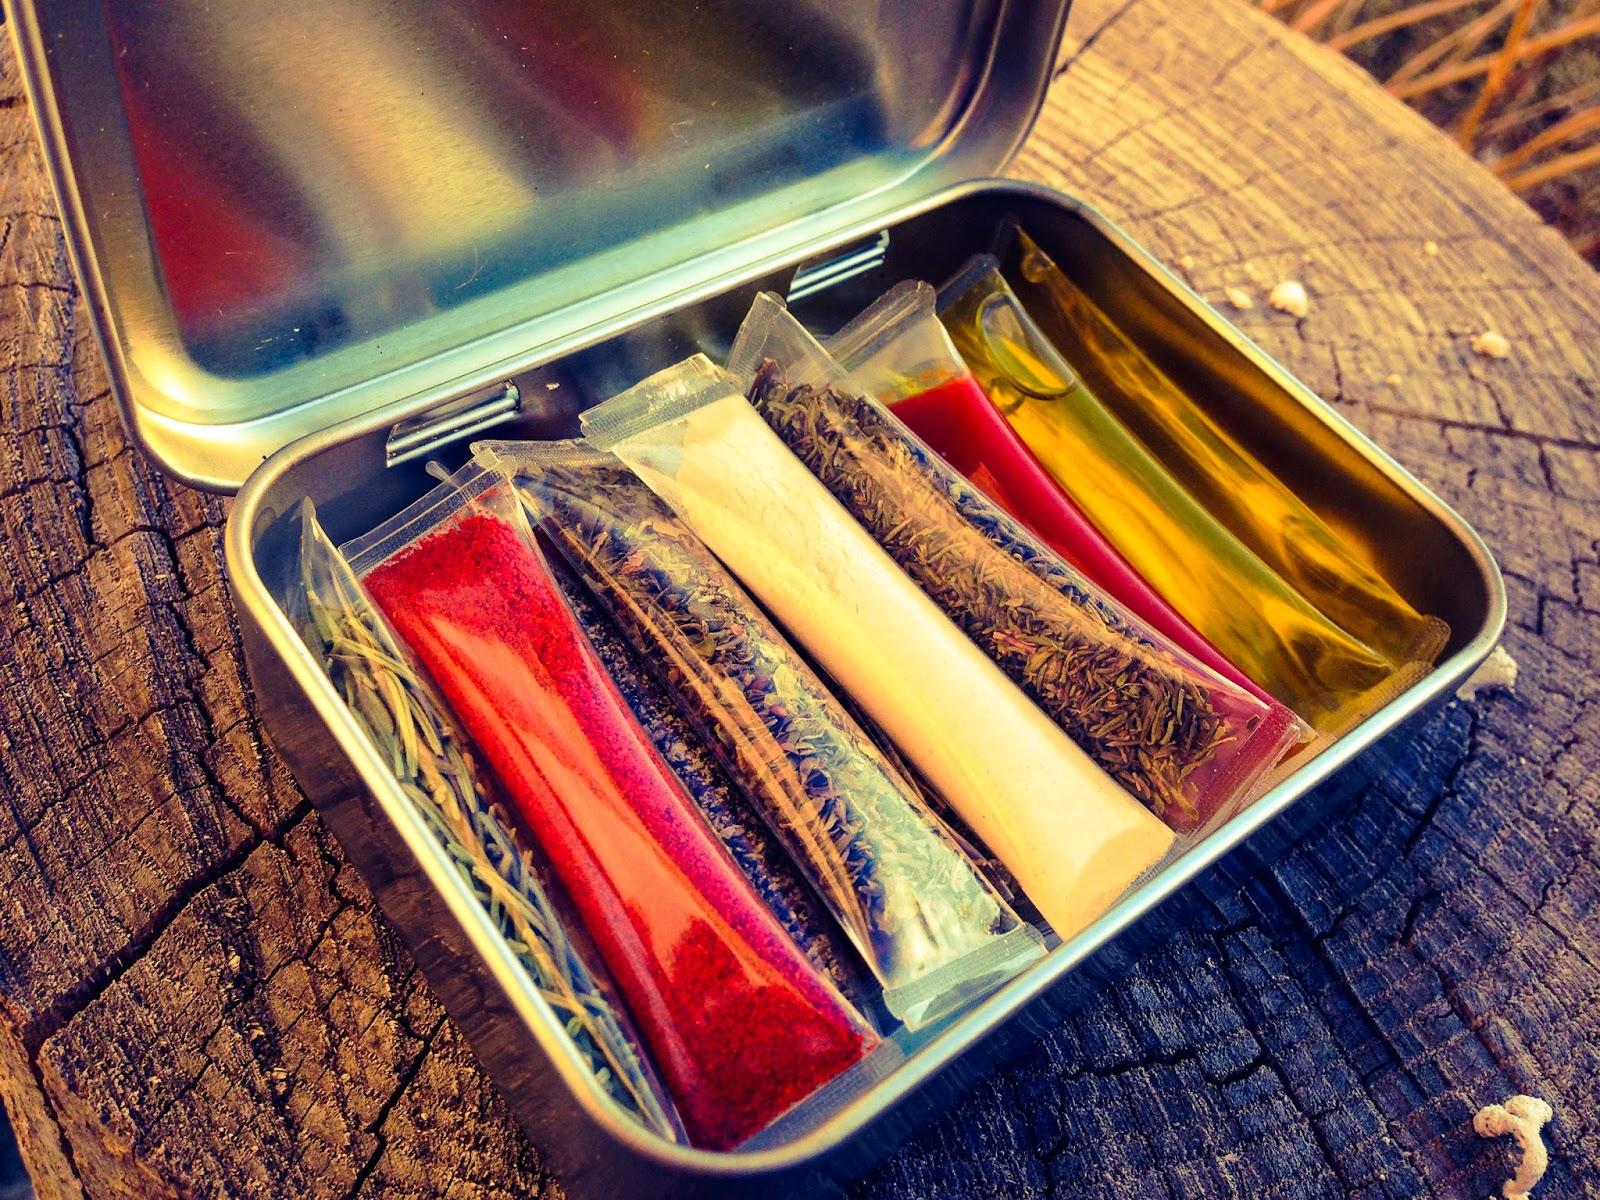 Travel spice kit altoid tin